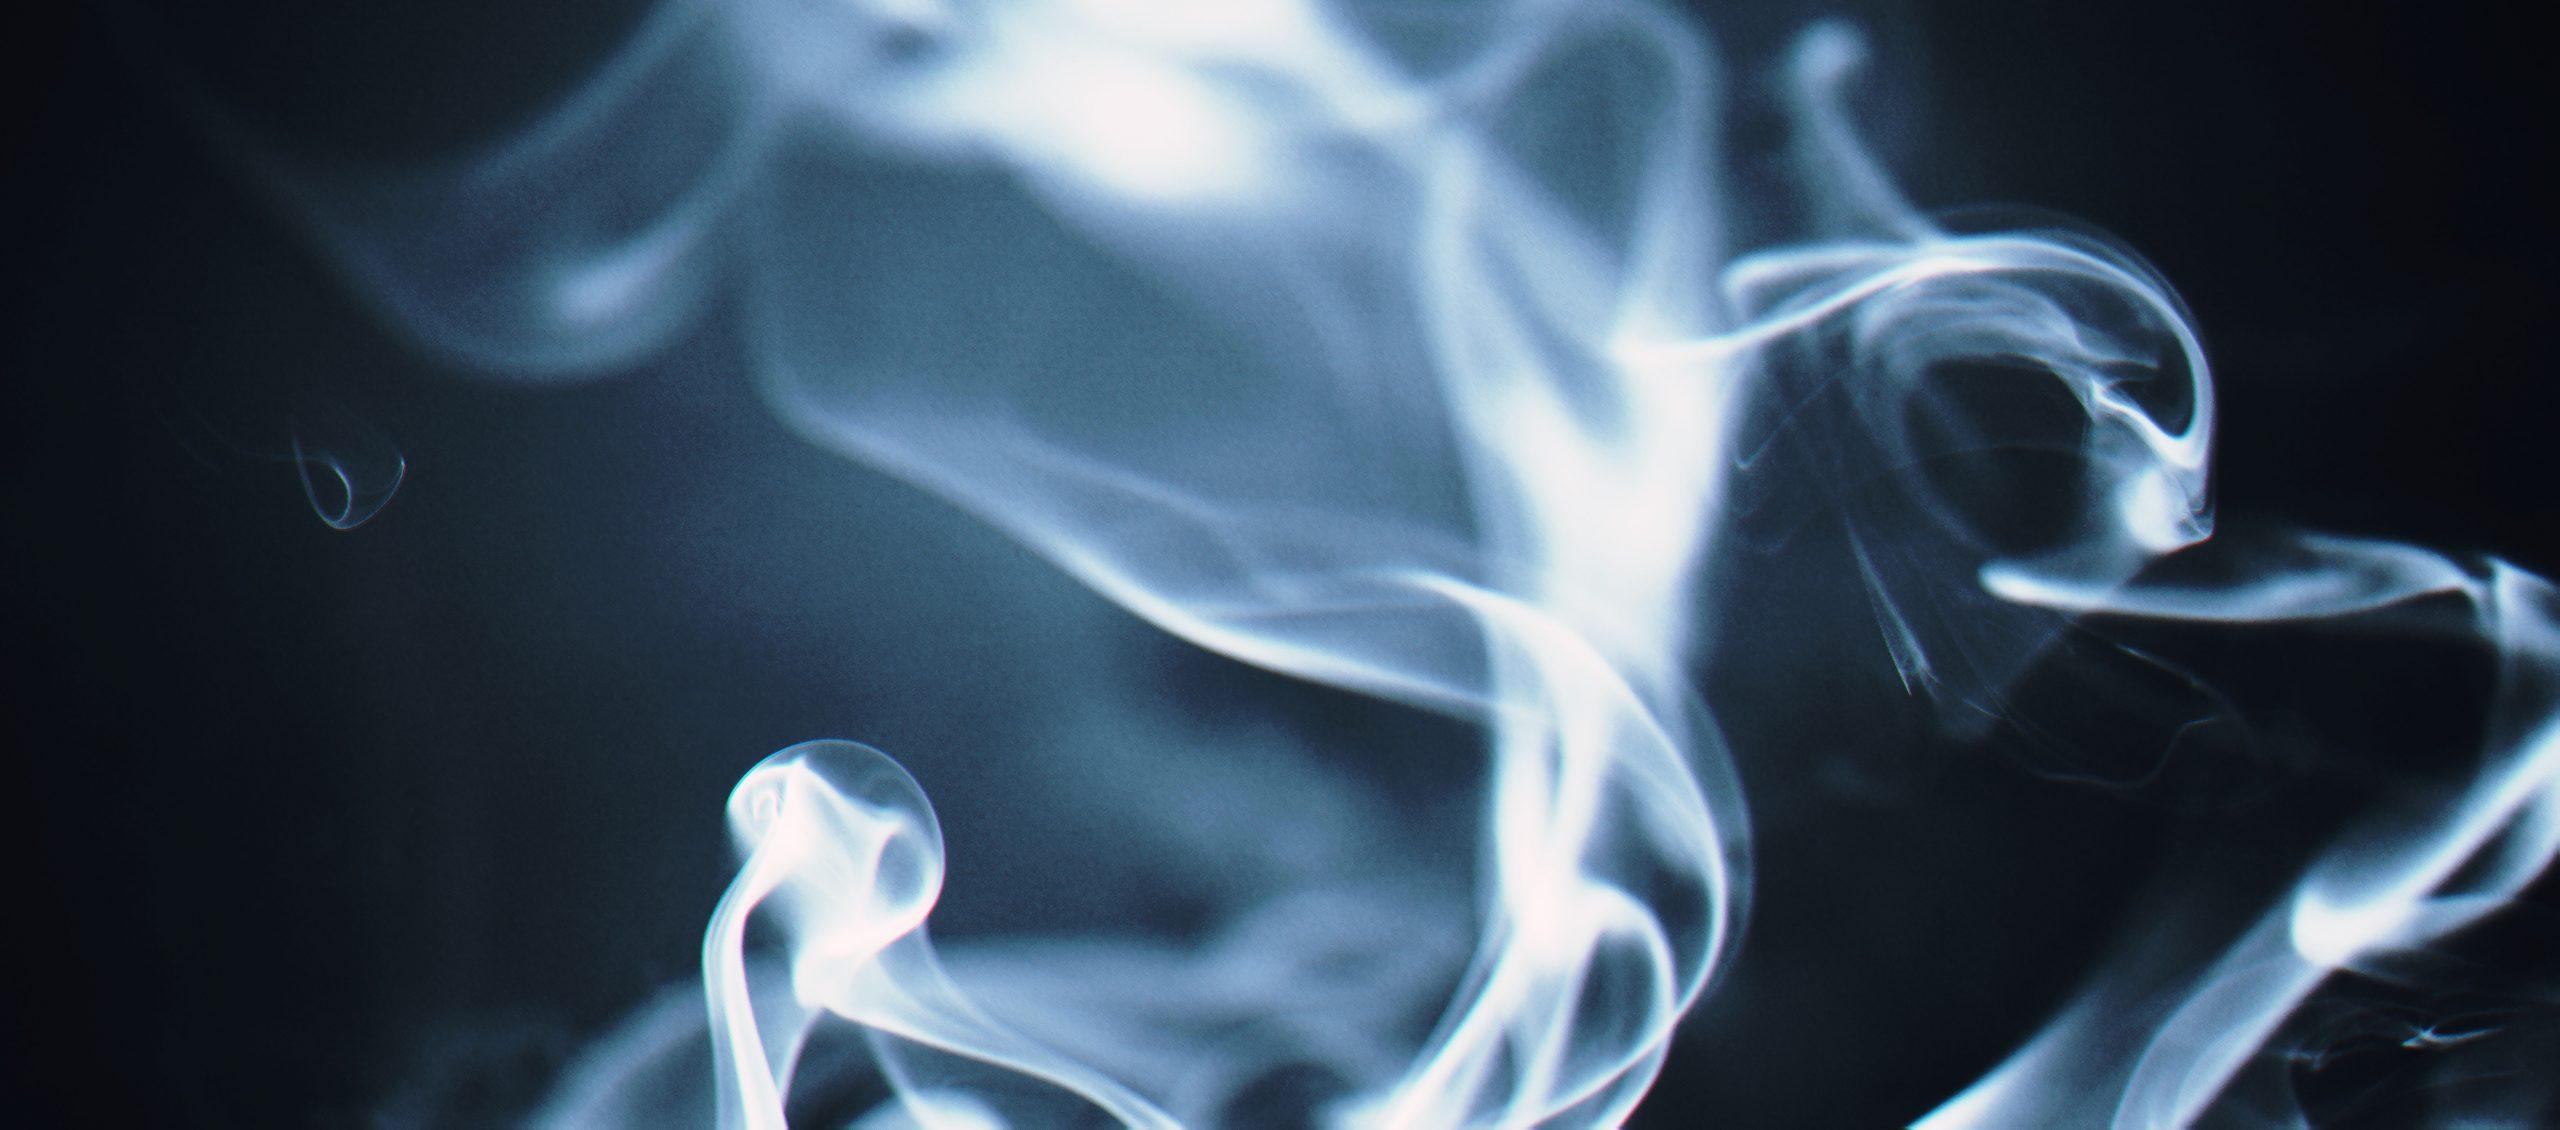 Epiphany From a Smoke Alarm